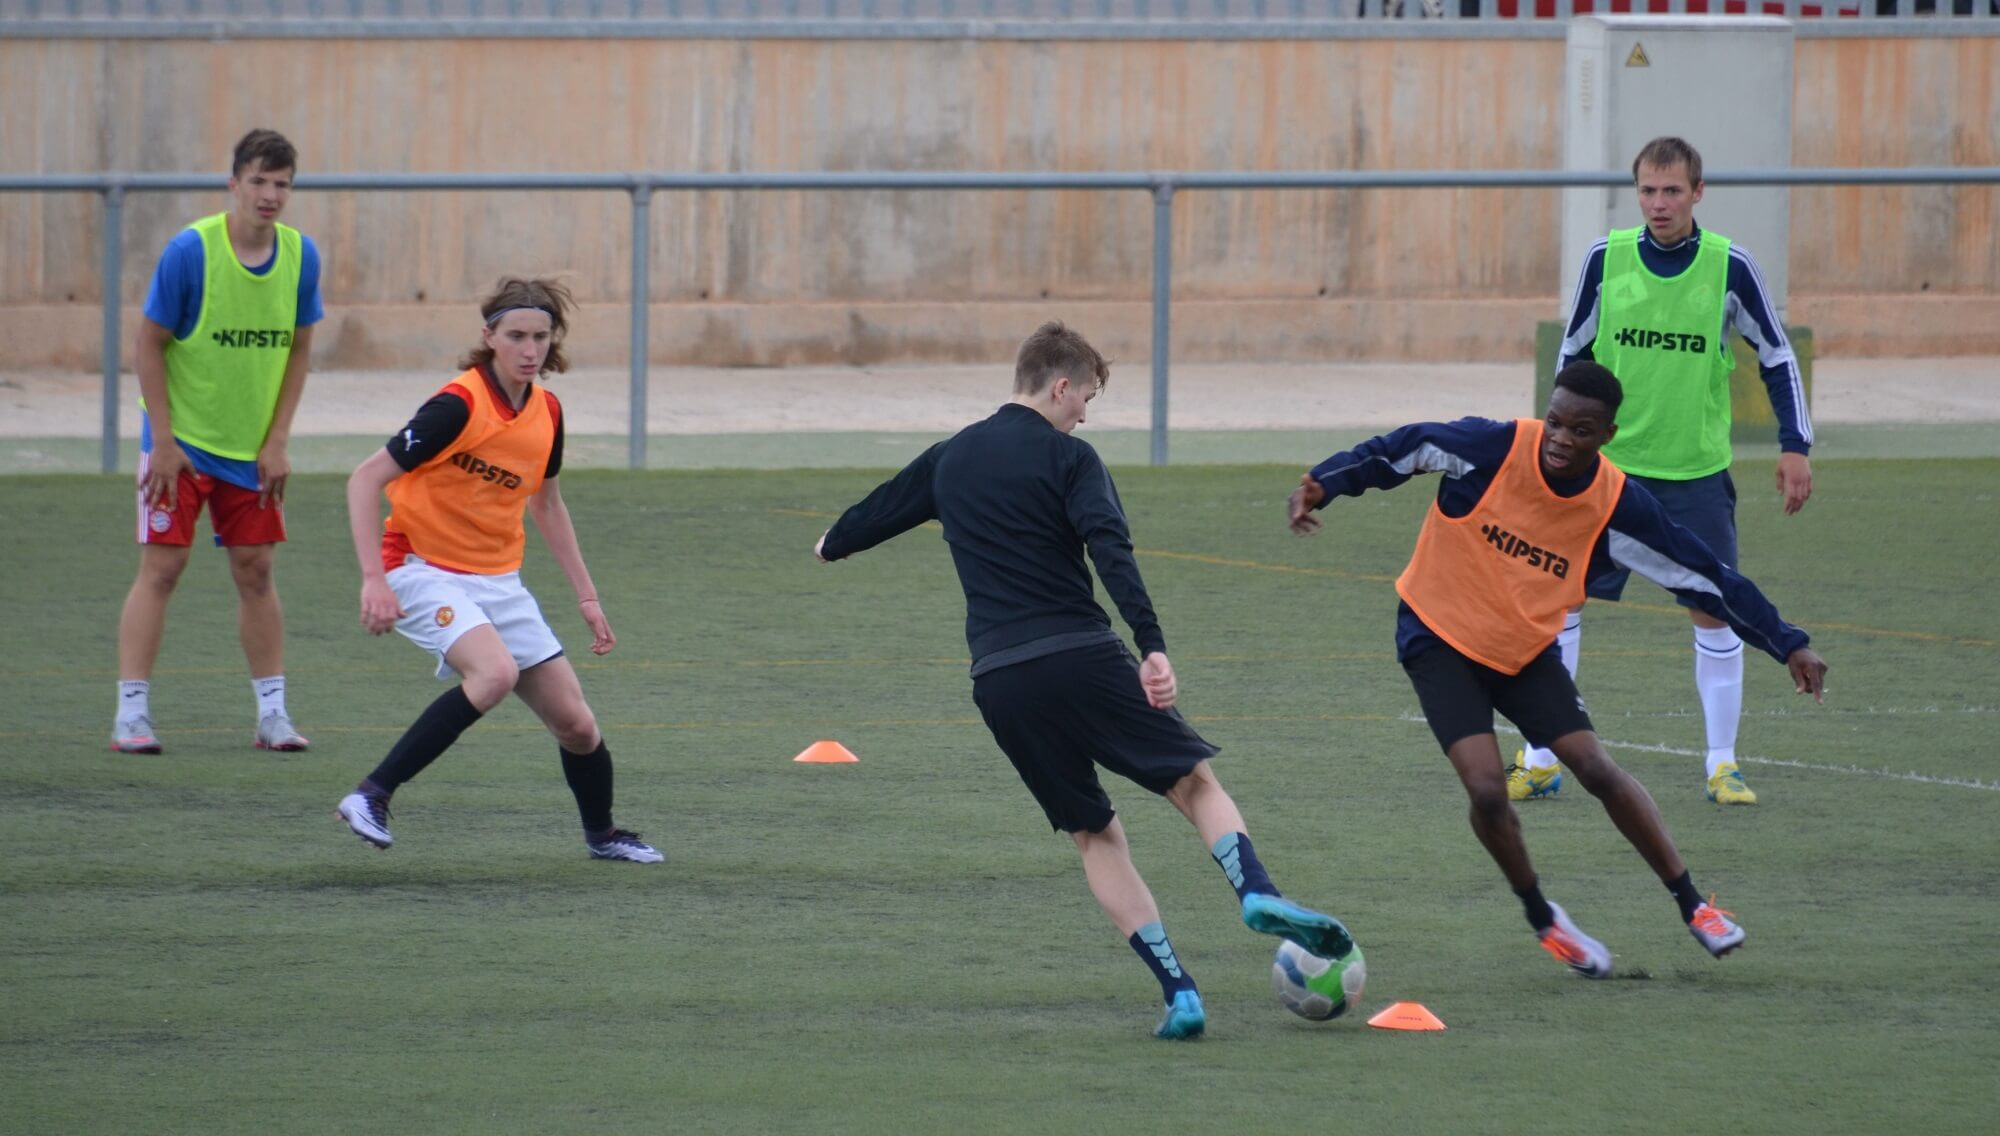 Football trials in Spain 2016